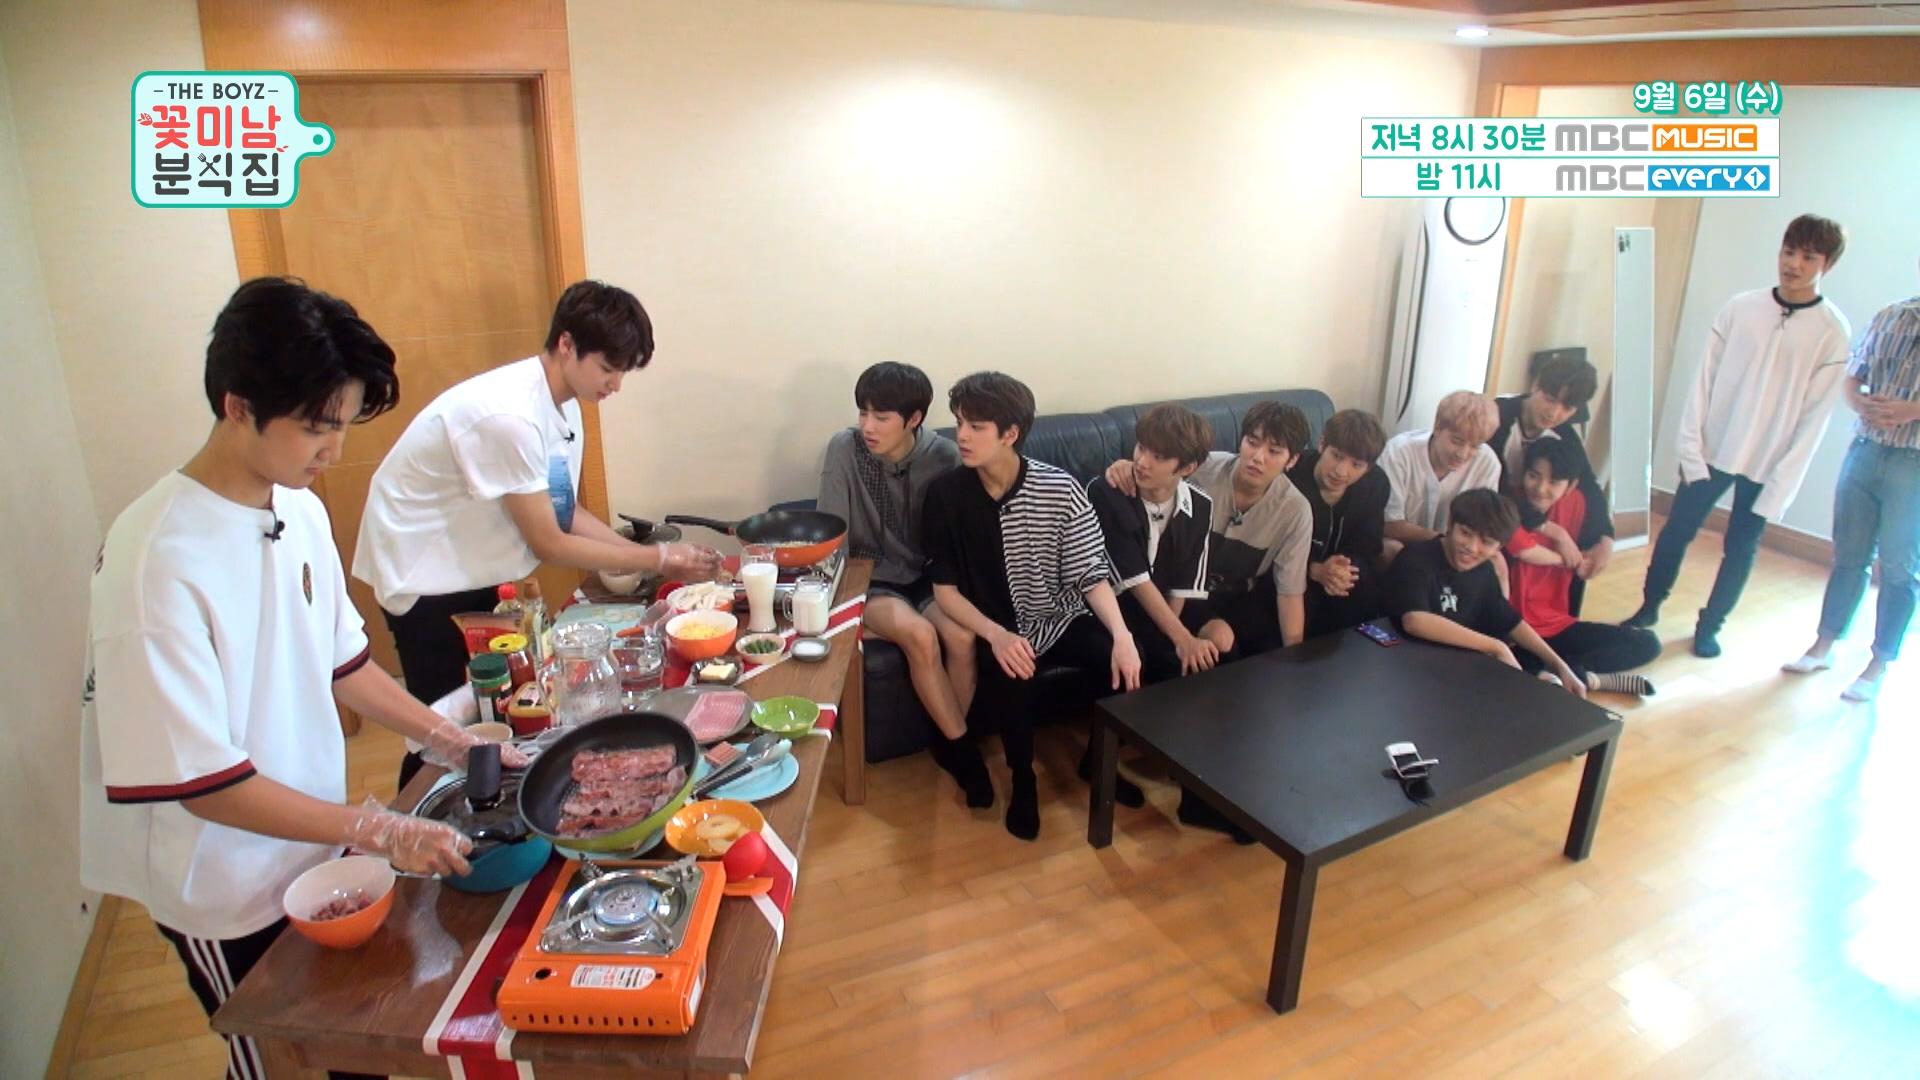 [Preview(Ep.3)] 더보이즈 '꽃미남 분식집' (THE BOYZ 'Flower Snack')